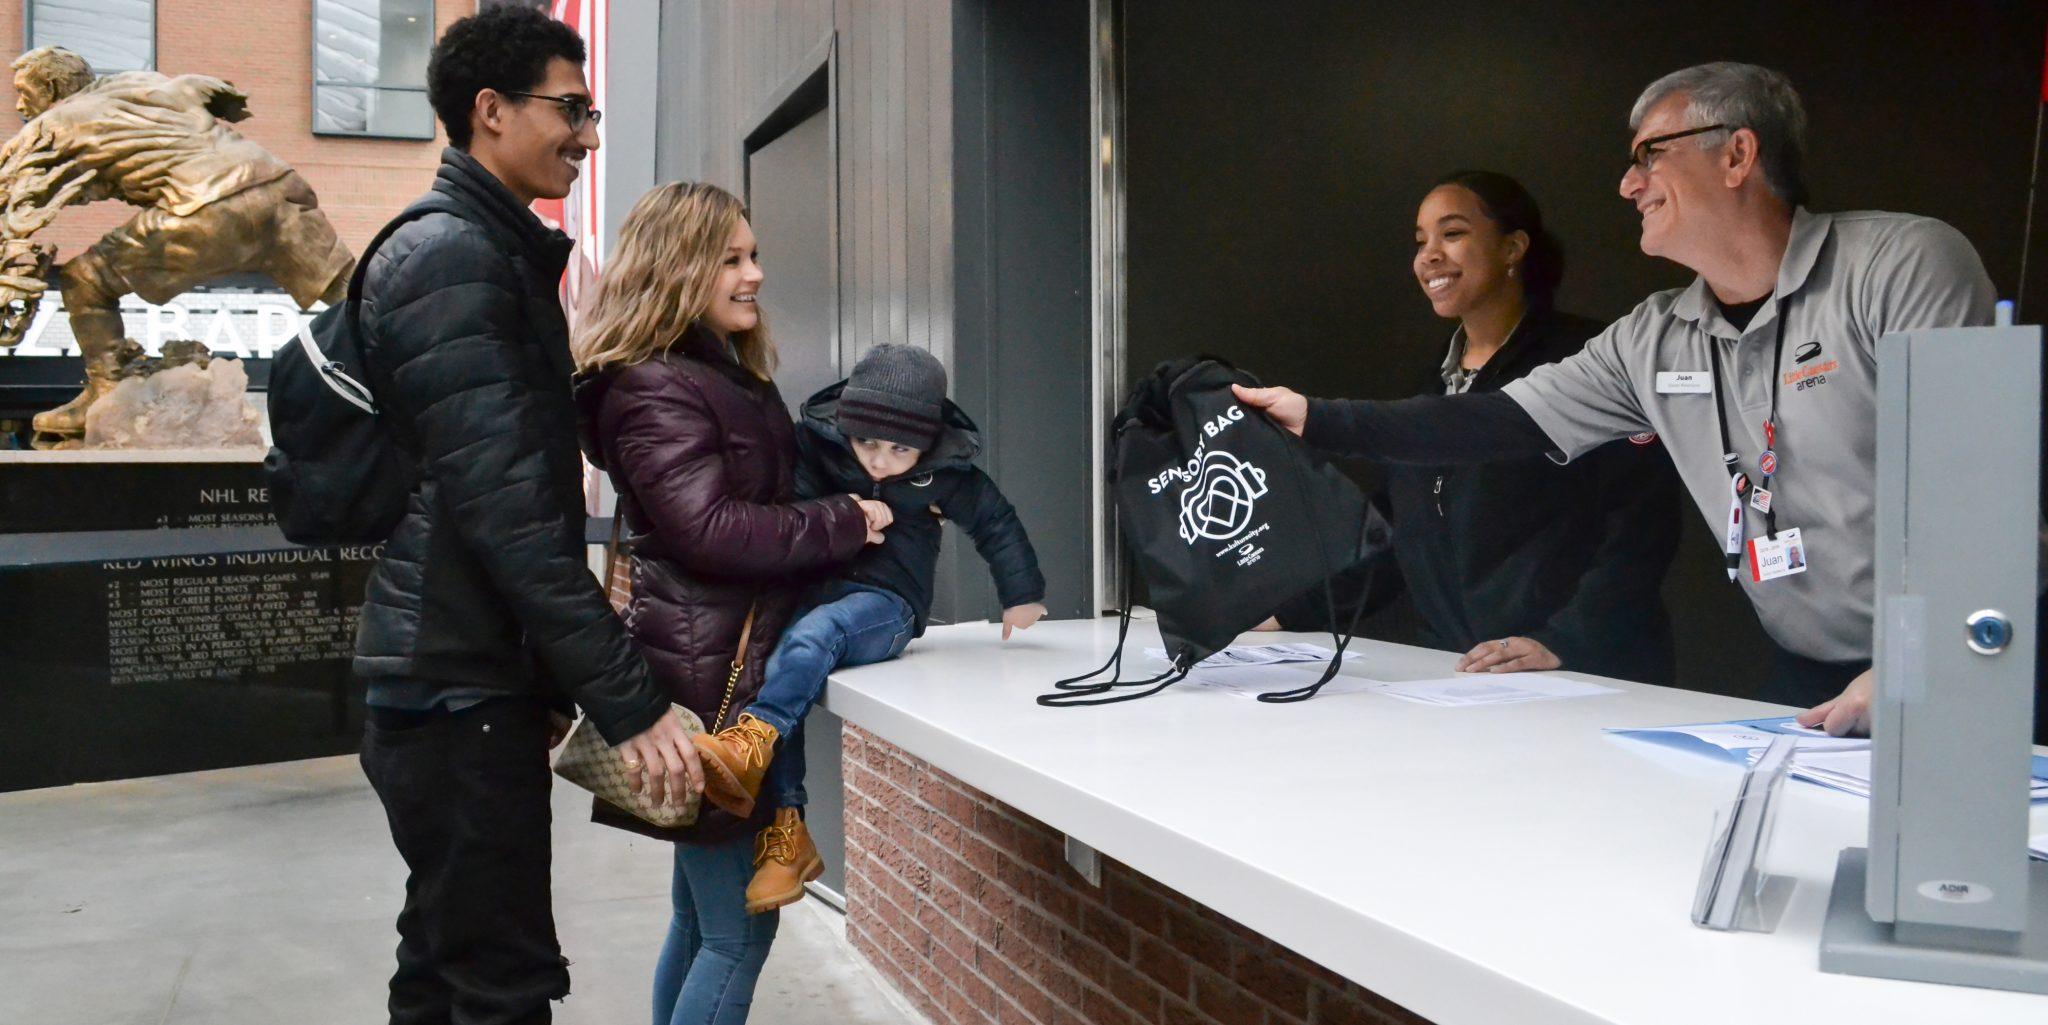 Nonprofit Helps Venues Expand Their Audiences